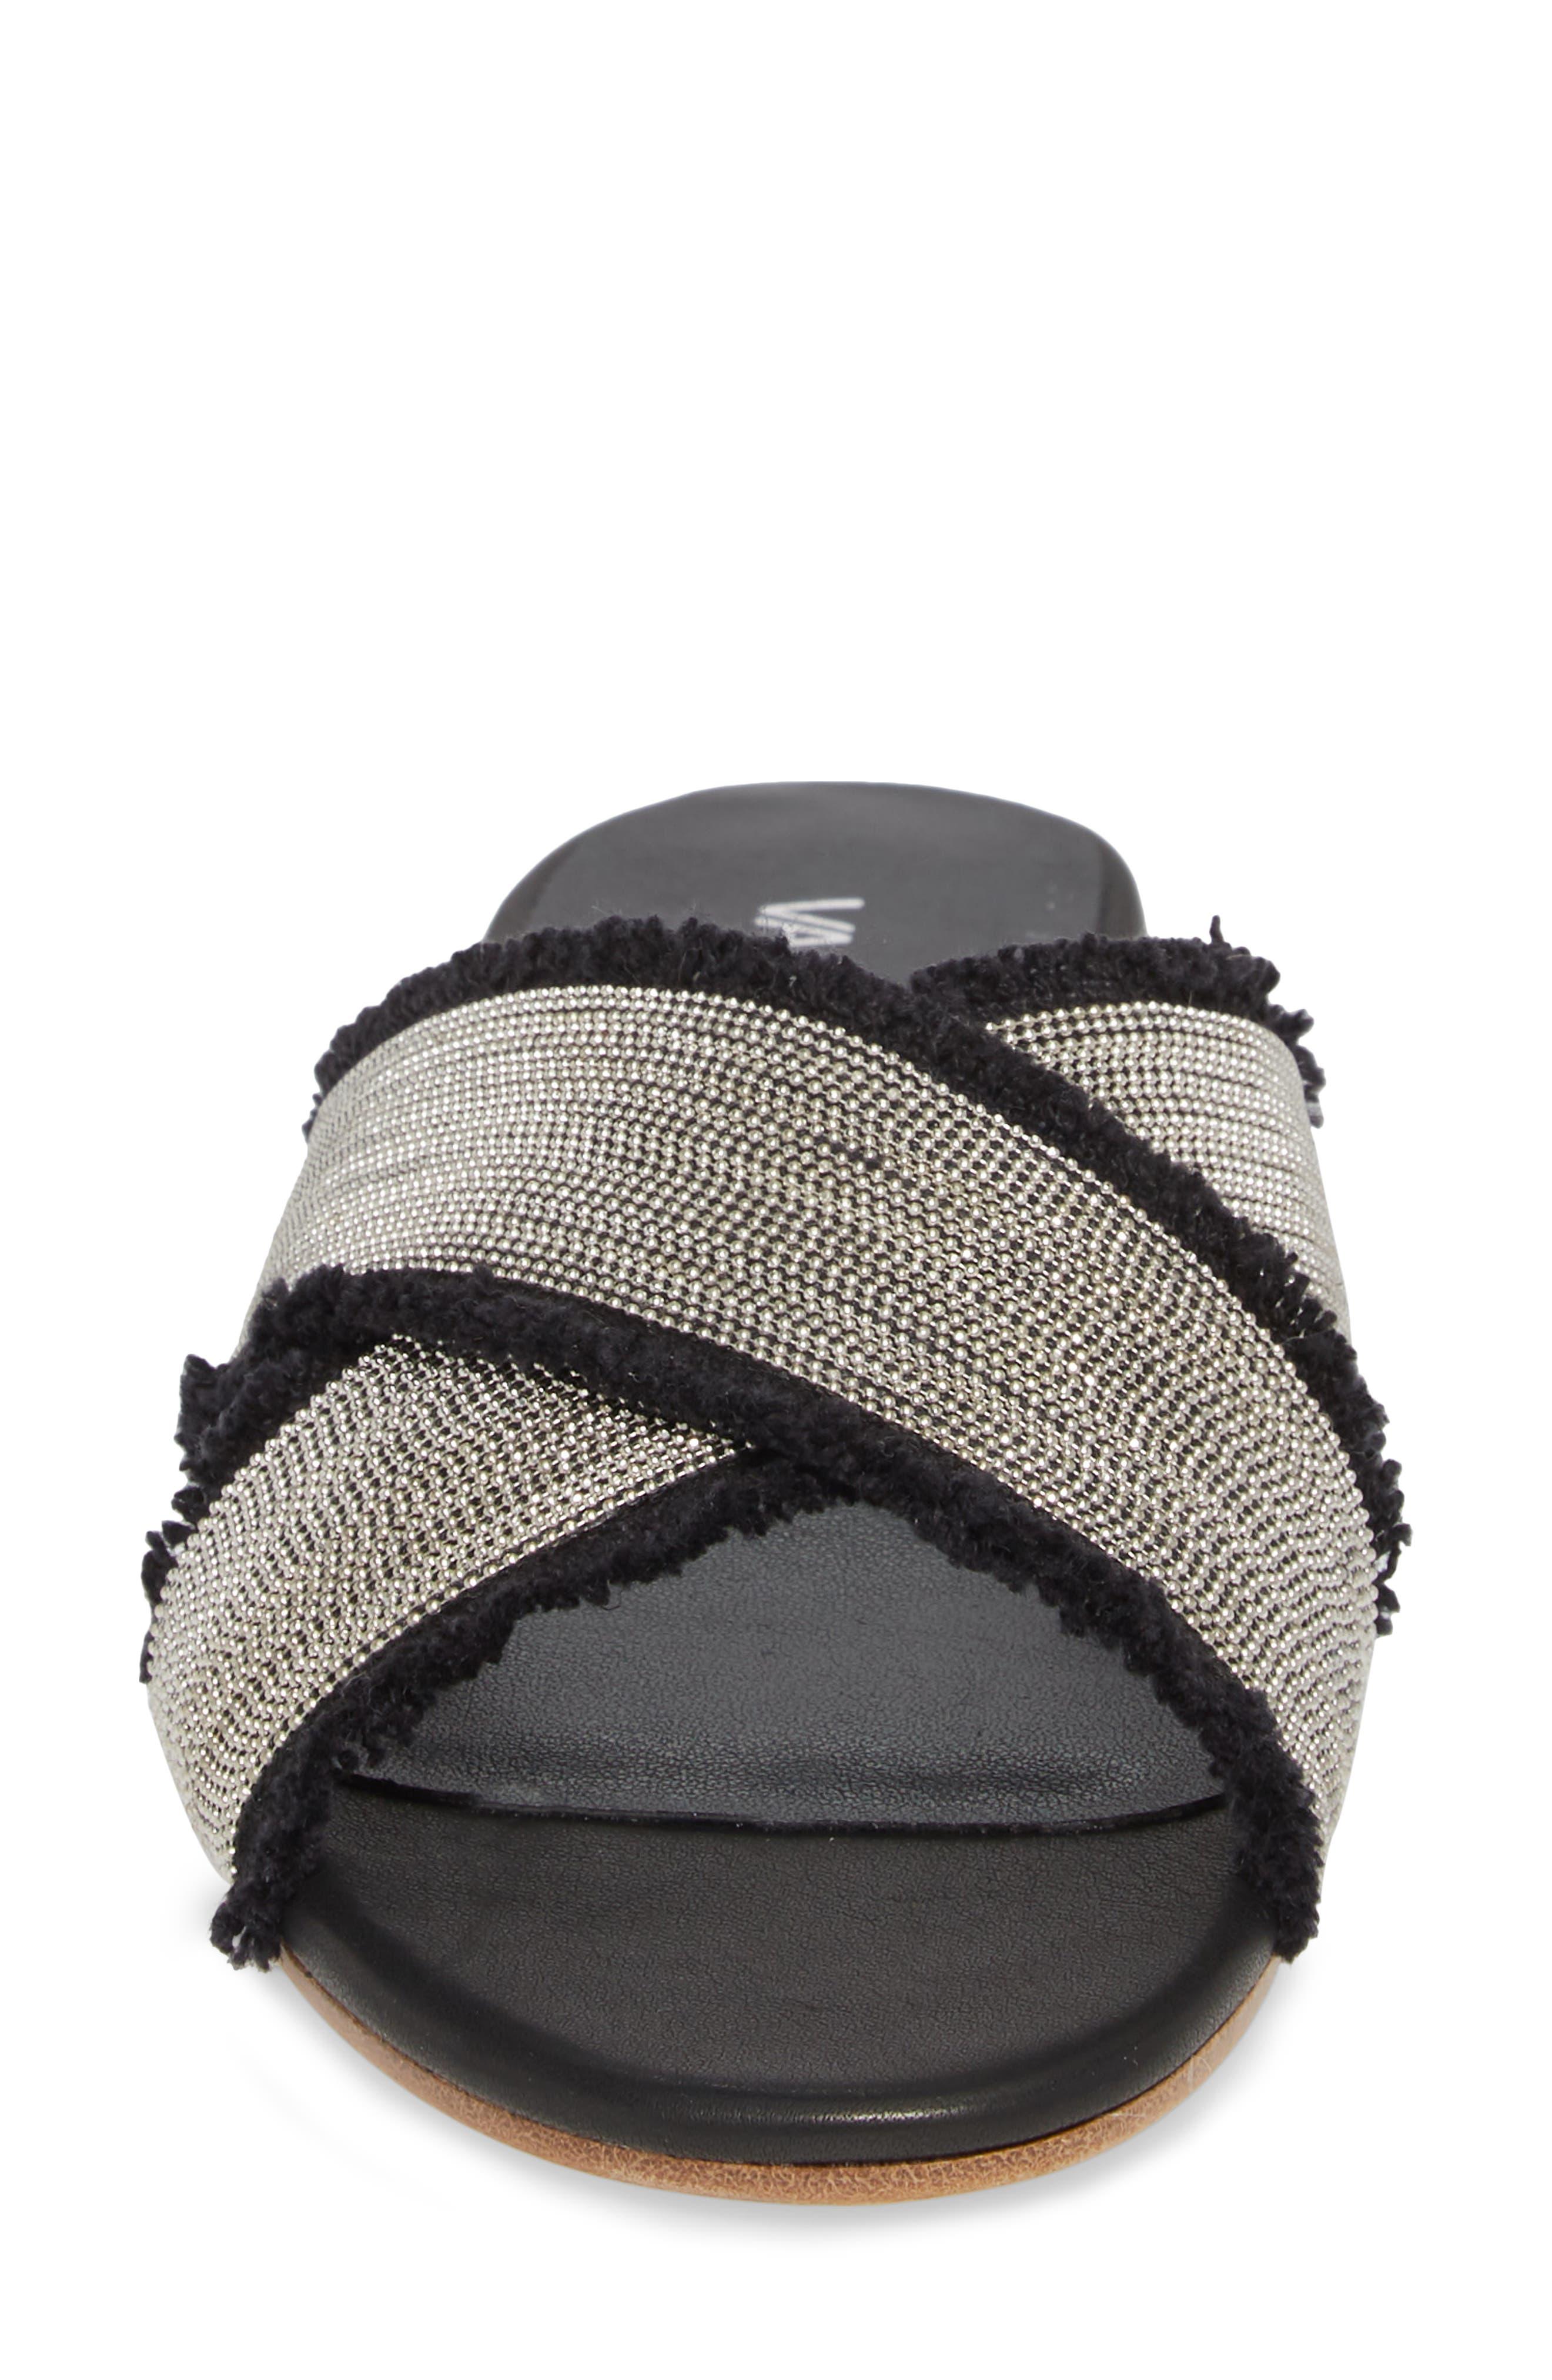 Baret Embellished Cross Strap Slide Sandal,                             Alternate thumbnail 4, color,                             BLACK FABRIC